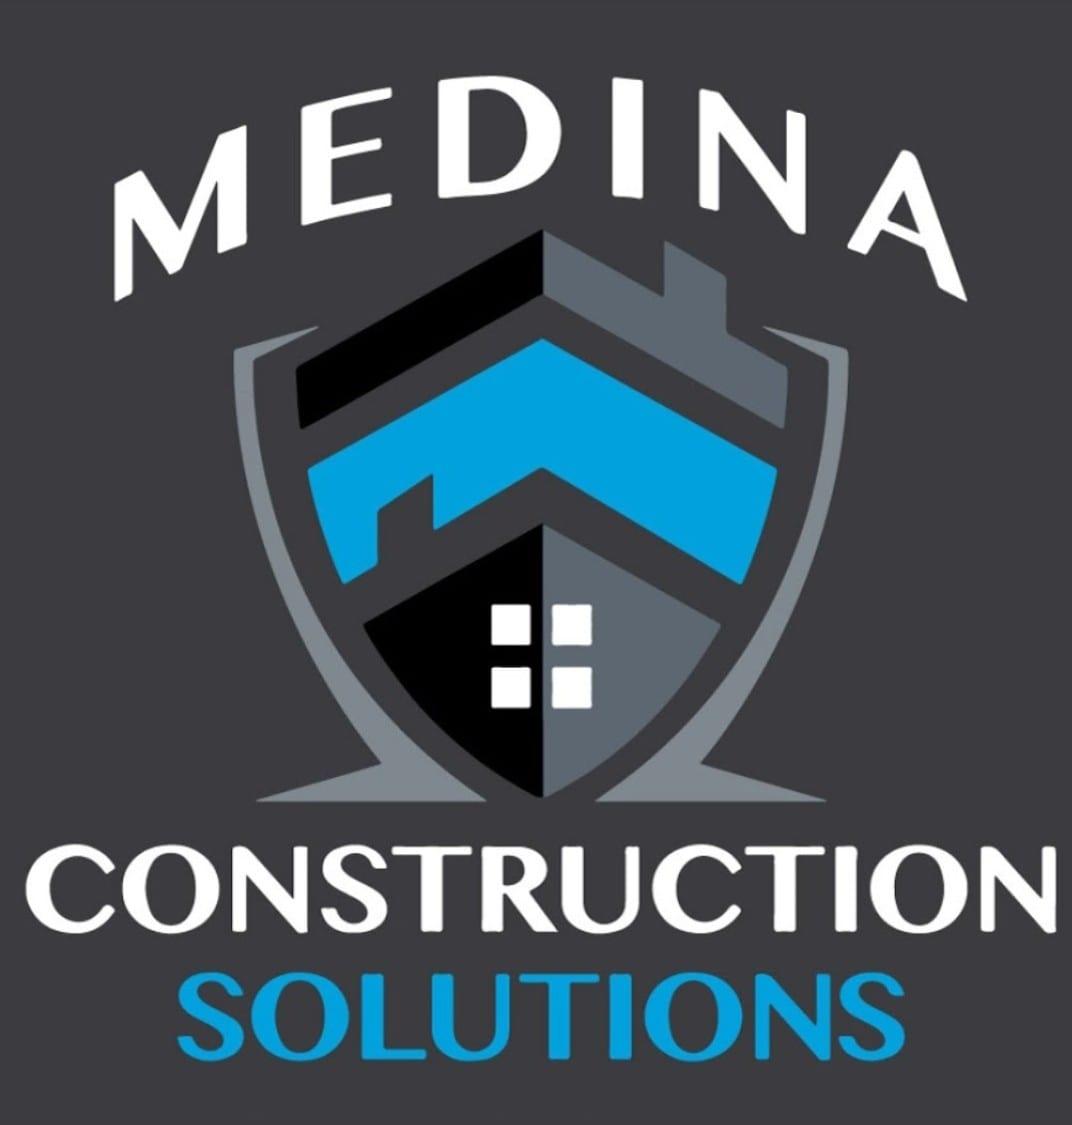 Medina Construction Solutions image 1